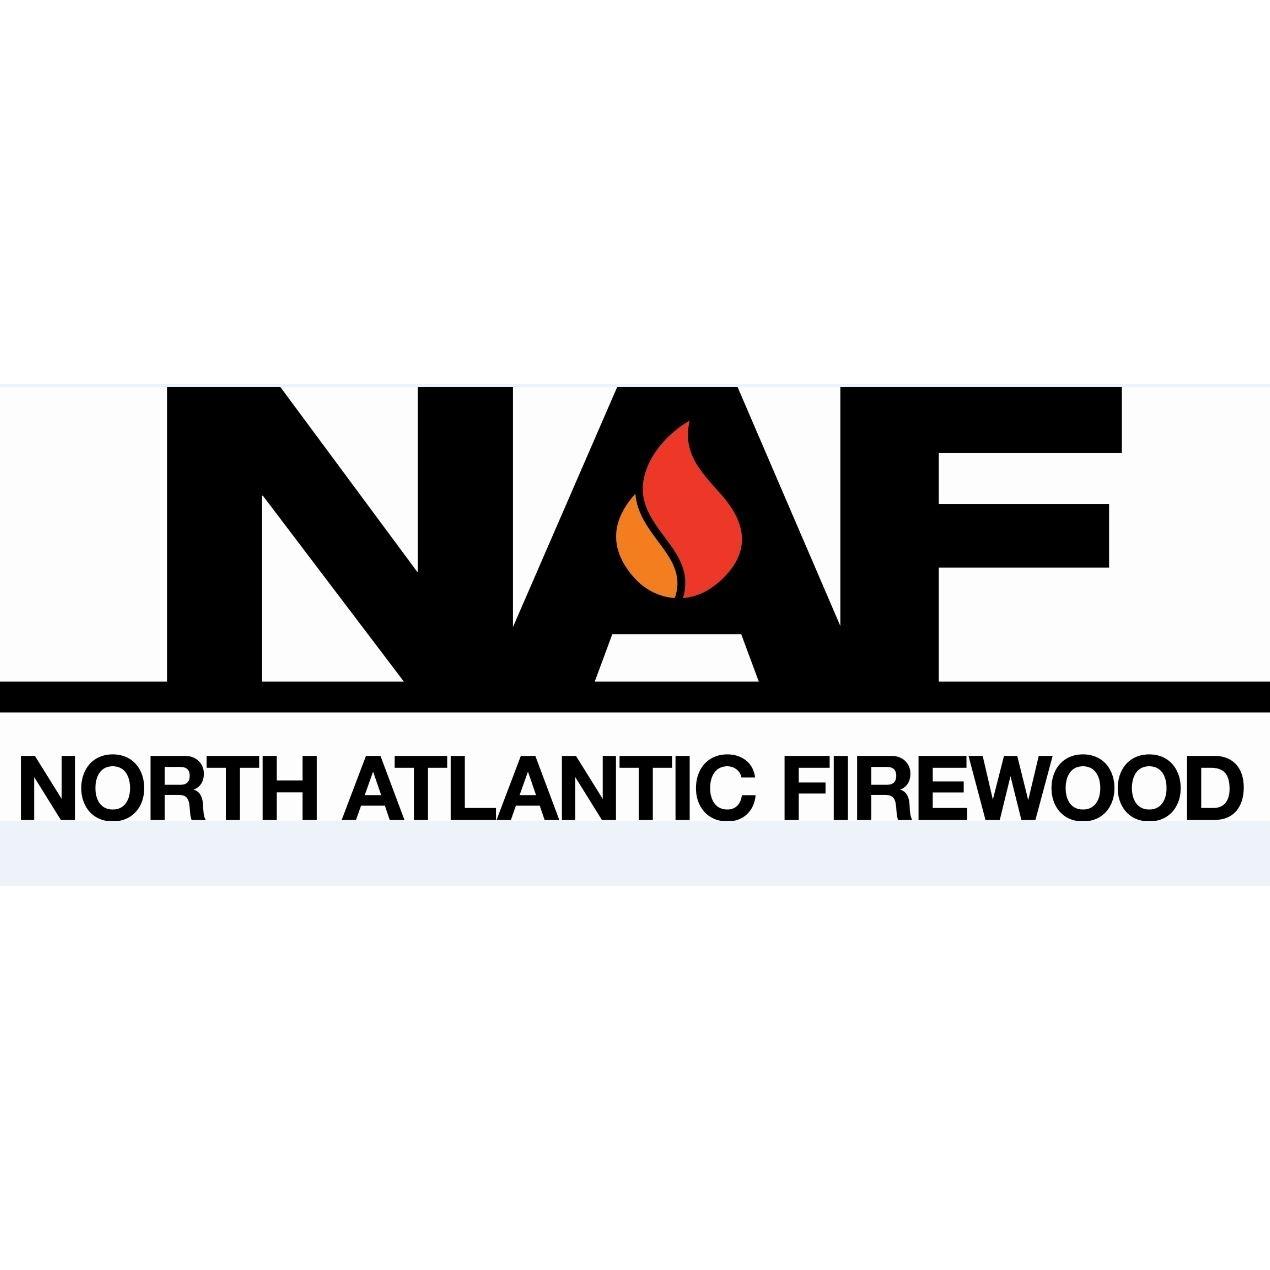 North Atlantic Firewood